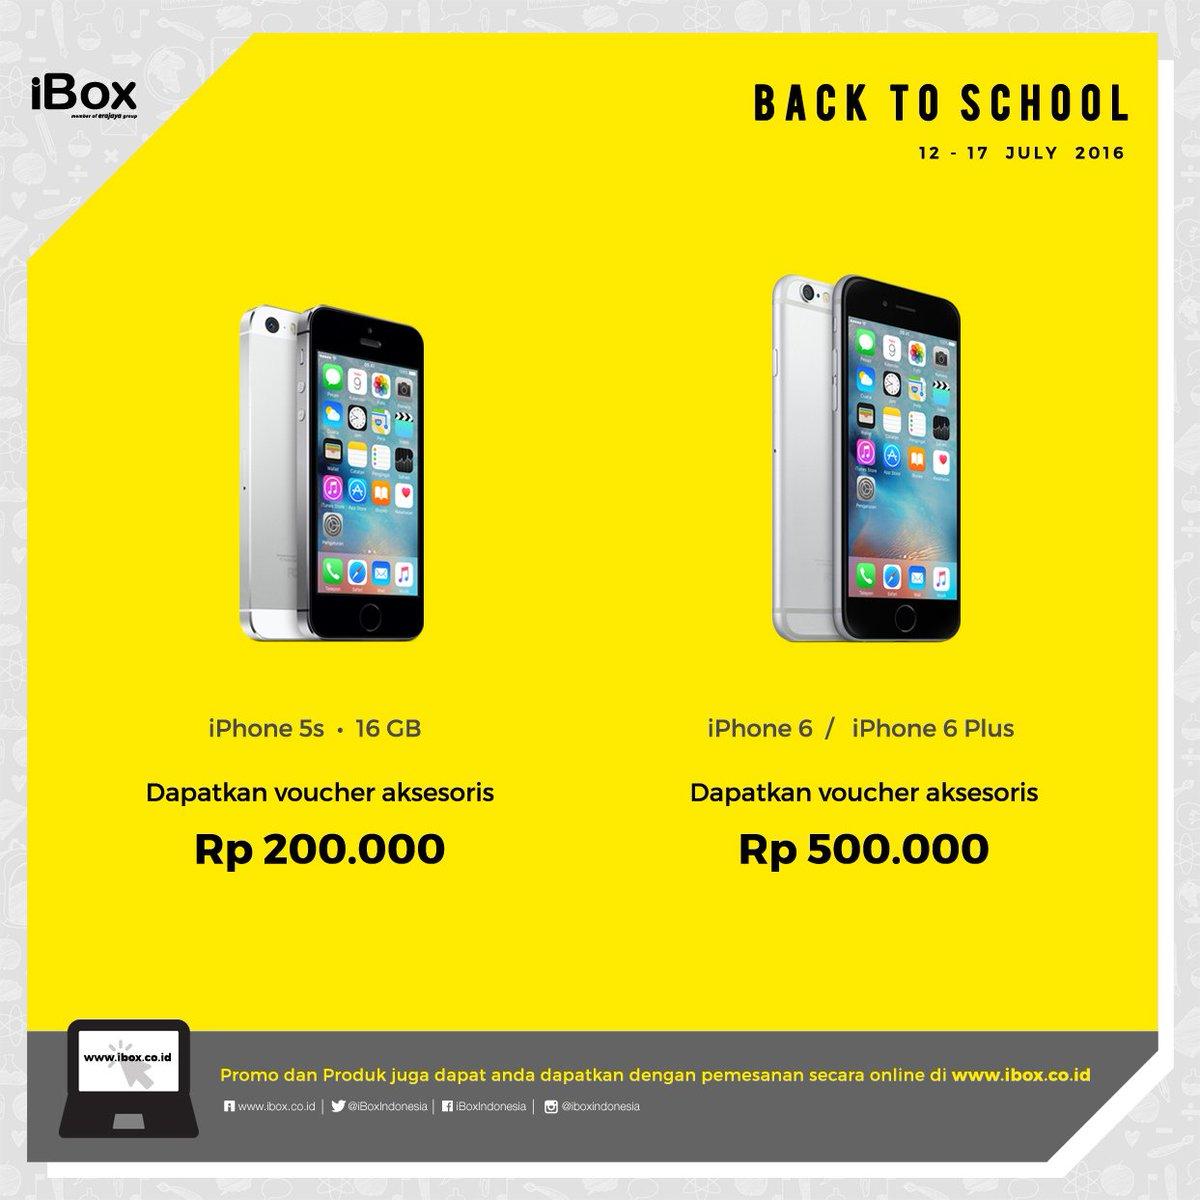 Ibox On Twitter Mohon Maaf Tidak Bisa Service Center Ada Di Mall Kelapa Gading Menteng Central Kota Kasablanka Summarecon Digital Center